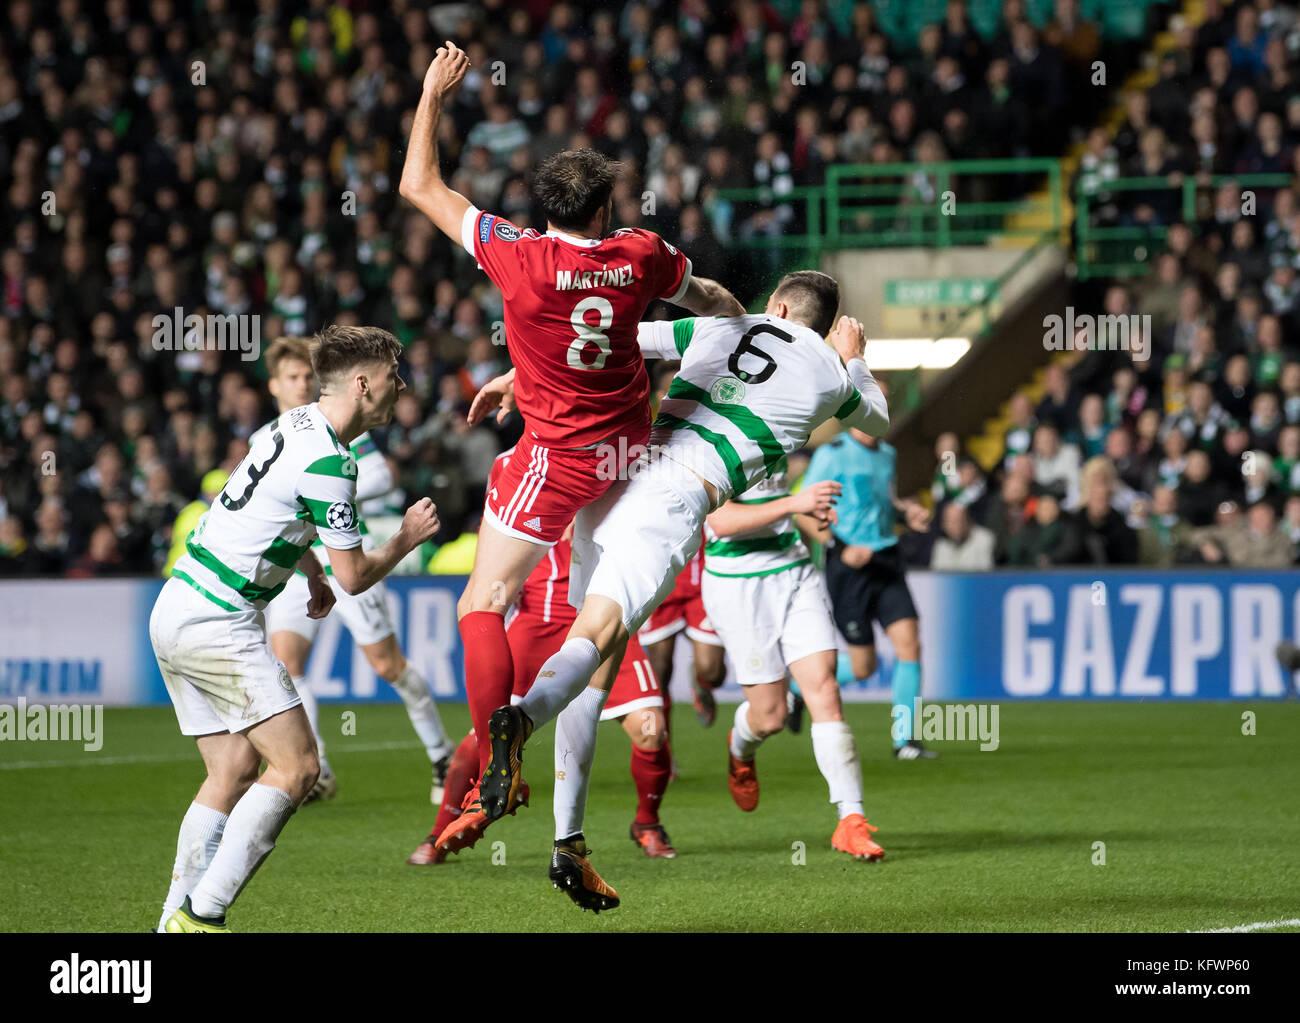 Glasgow, UK. 31st Oct, 2017. Javi Martinez of Bayern scores 1-2 after winning aagainst Glasgow's Nir Bitton - Stock Image